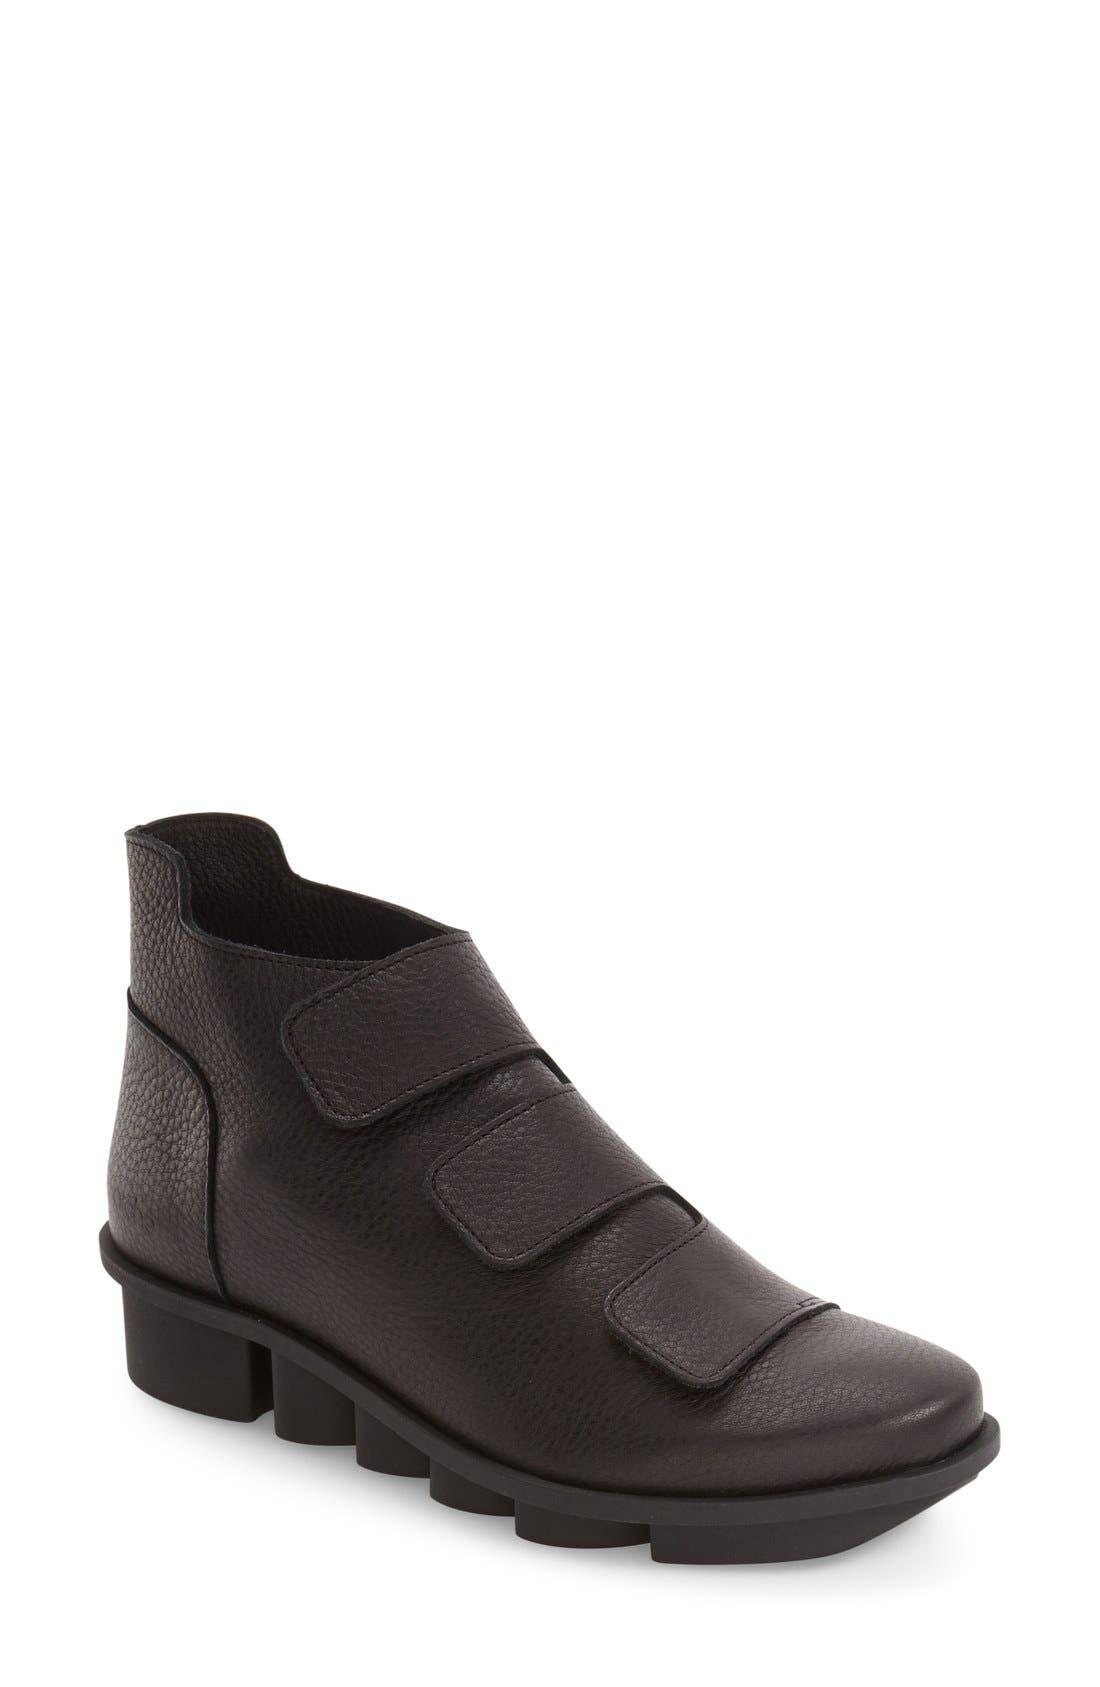 'Skapa' Sneaker,                             Main thumbnail 1, color,                             Noir Leather